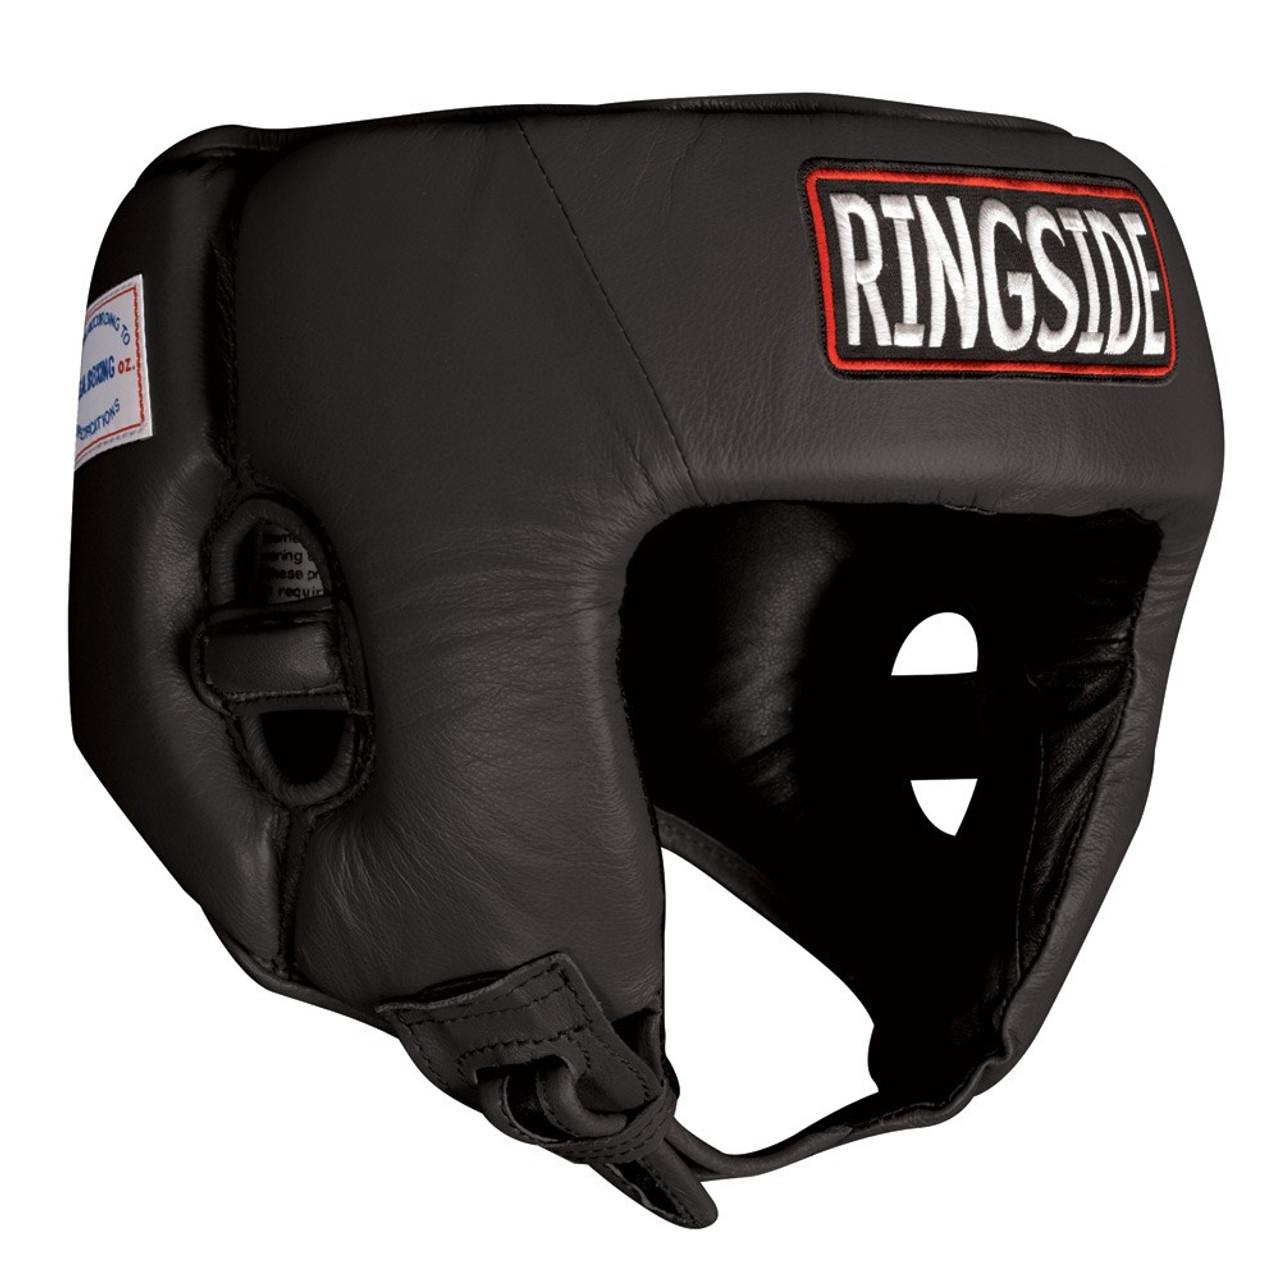 Ringside Full Face Training Boxing Head Gear